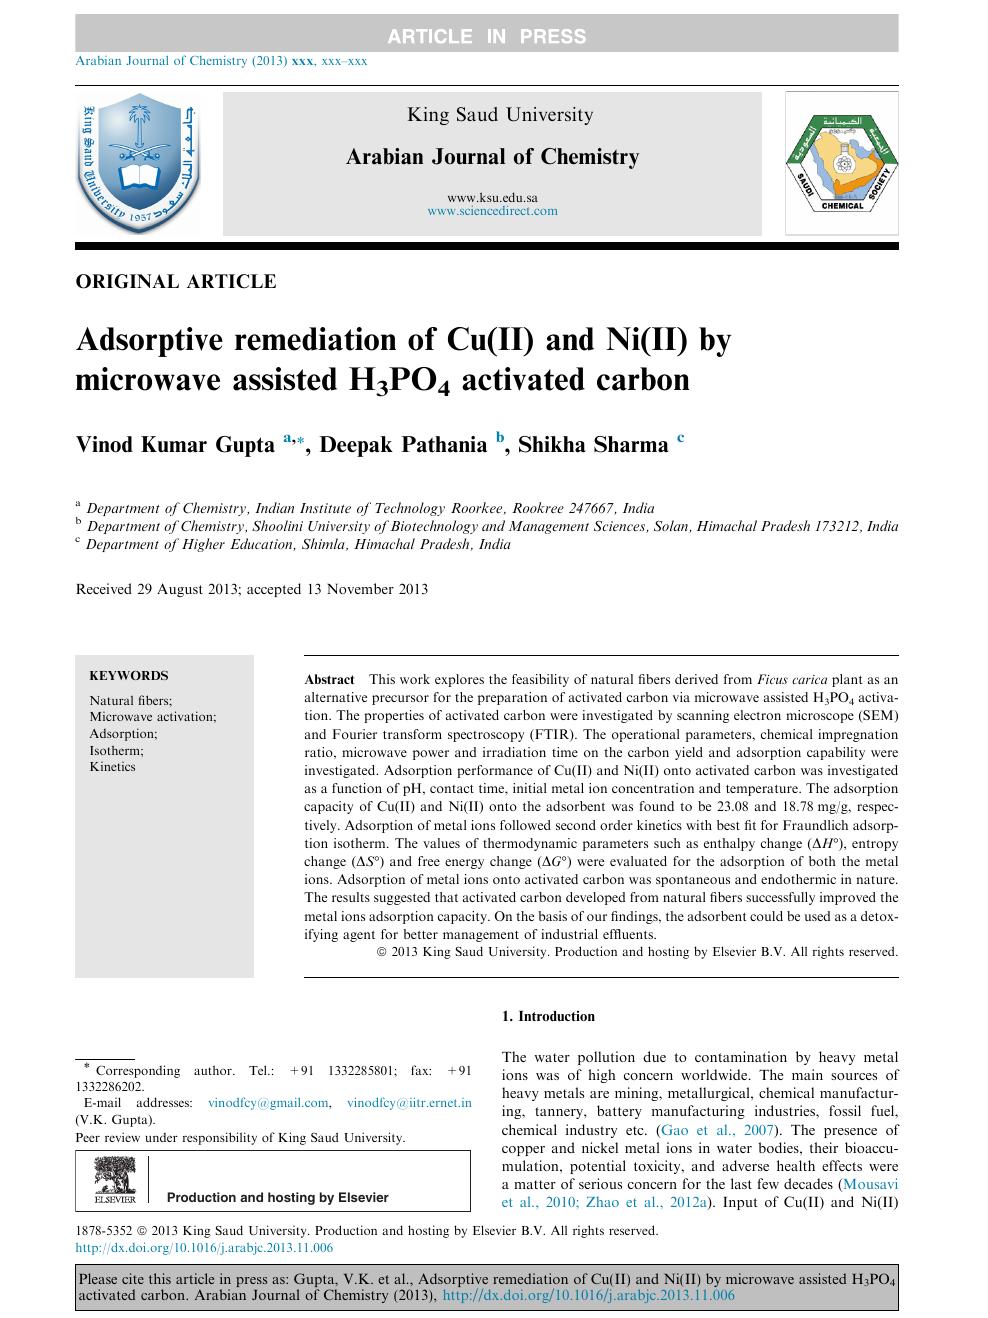 Adsorptive remediation of Cu(II) and Ni(II) by microwave